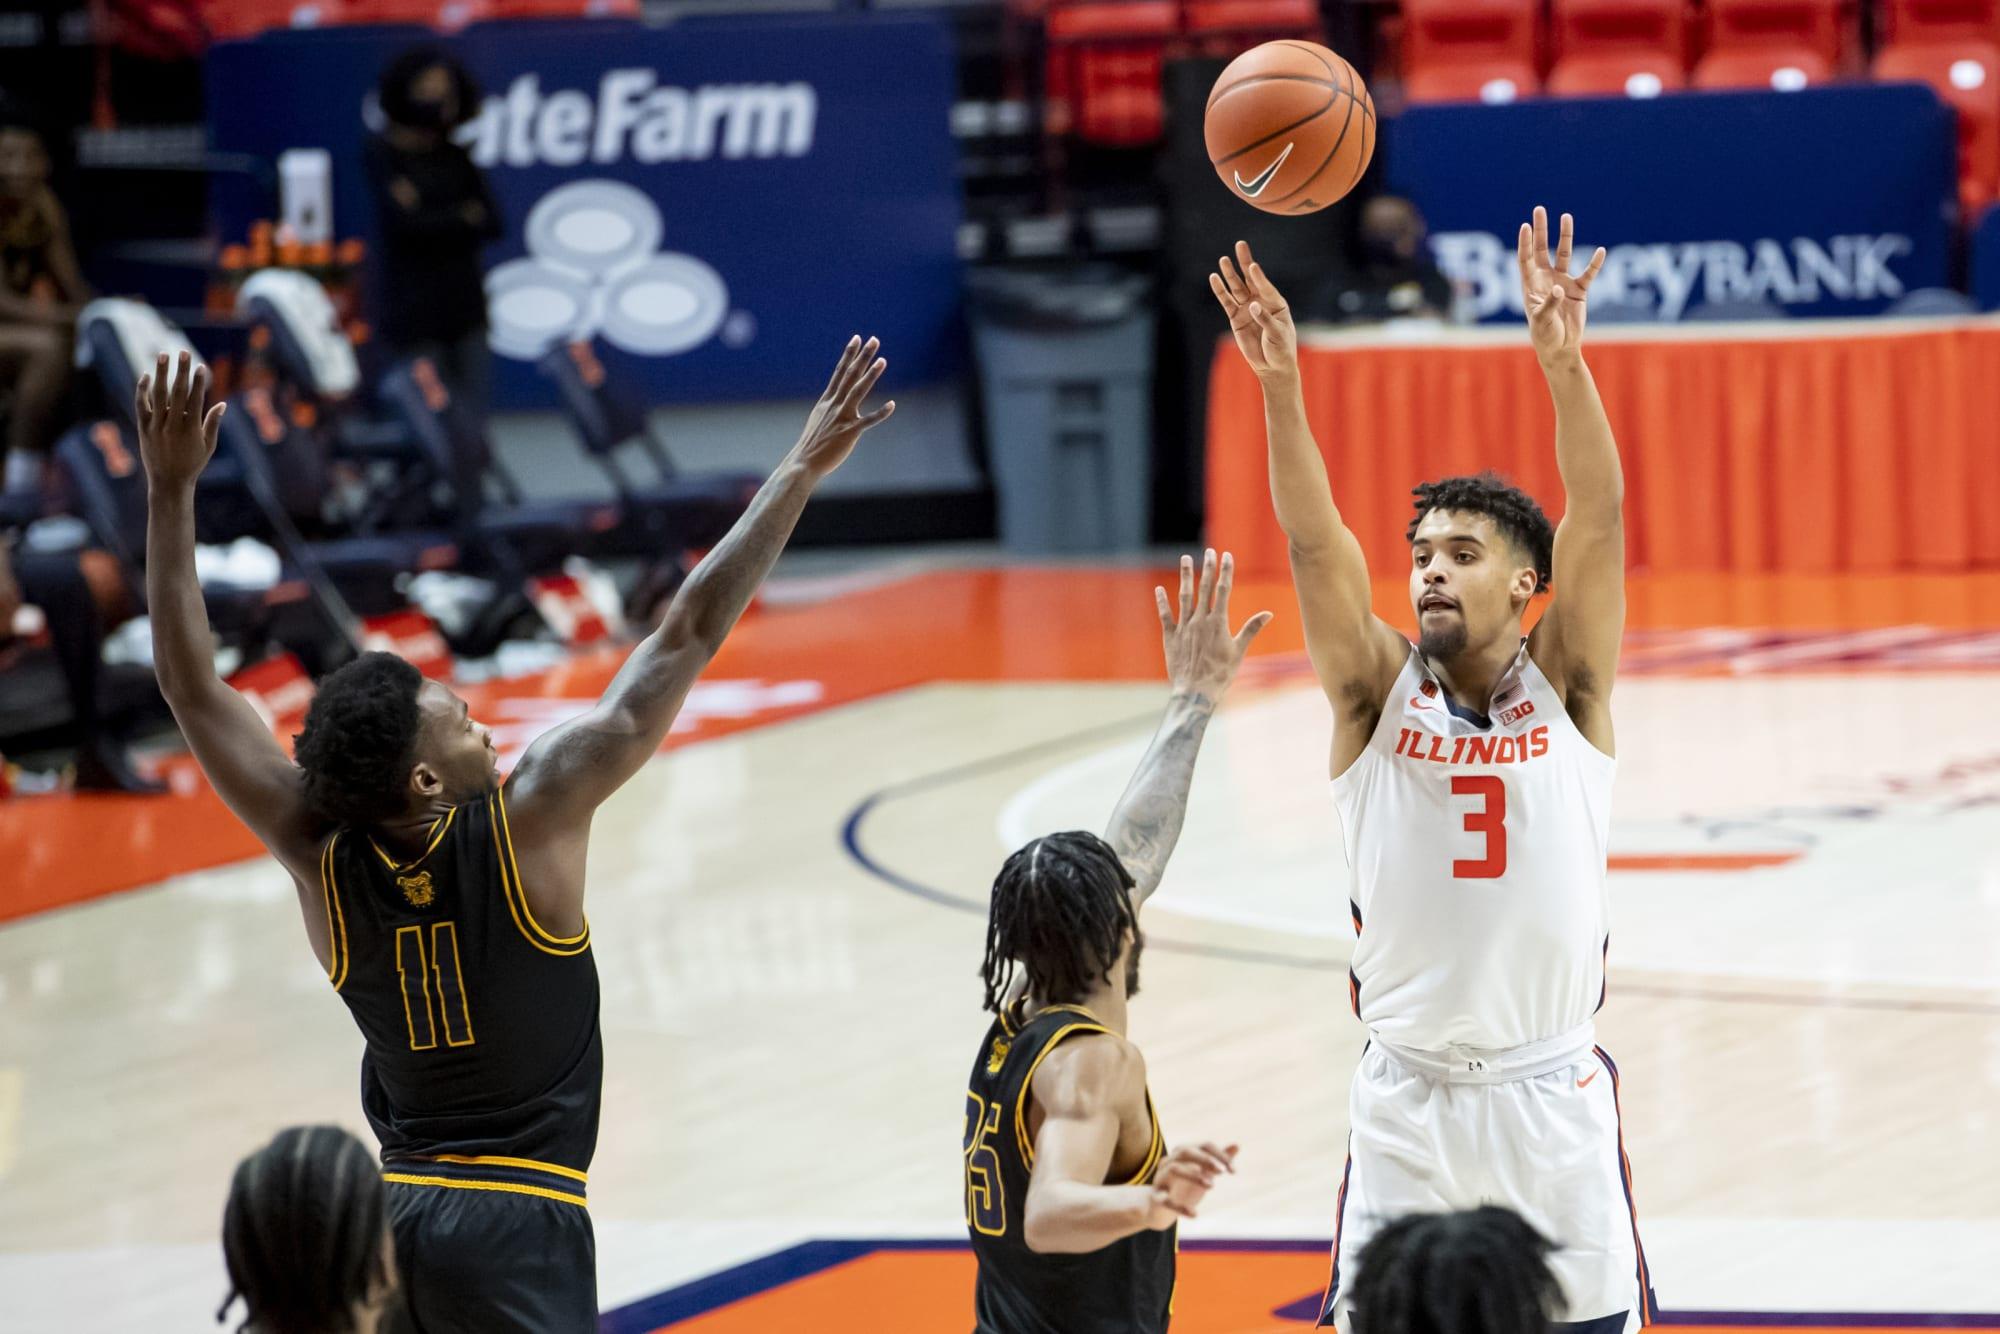 Illinois Basketball: 4 keys for the Illini to beat the Ohio Bobcats